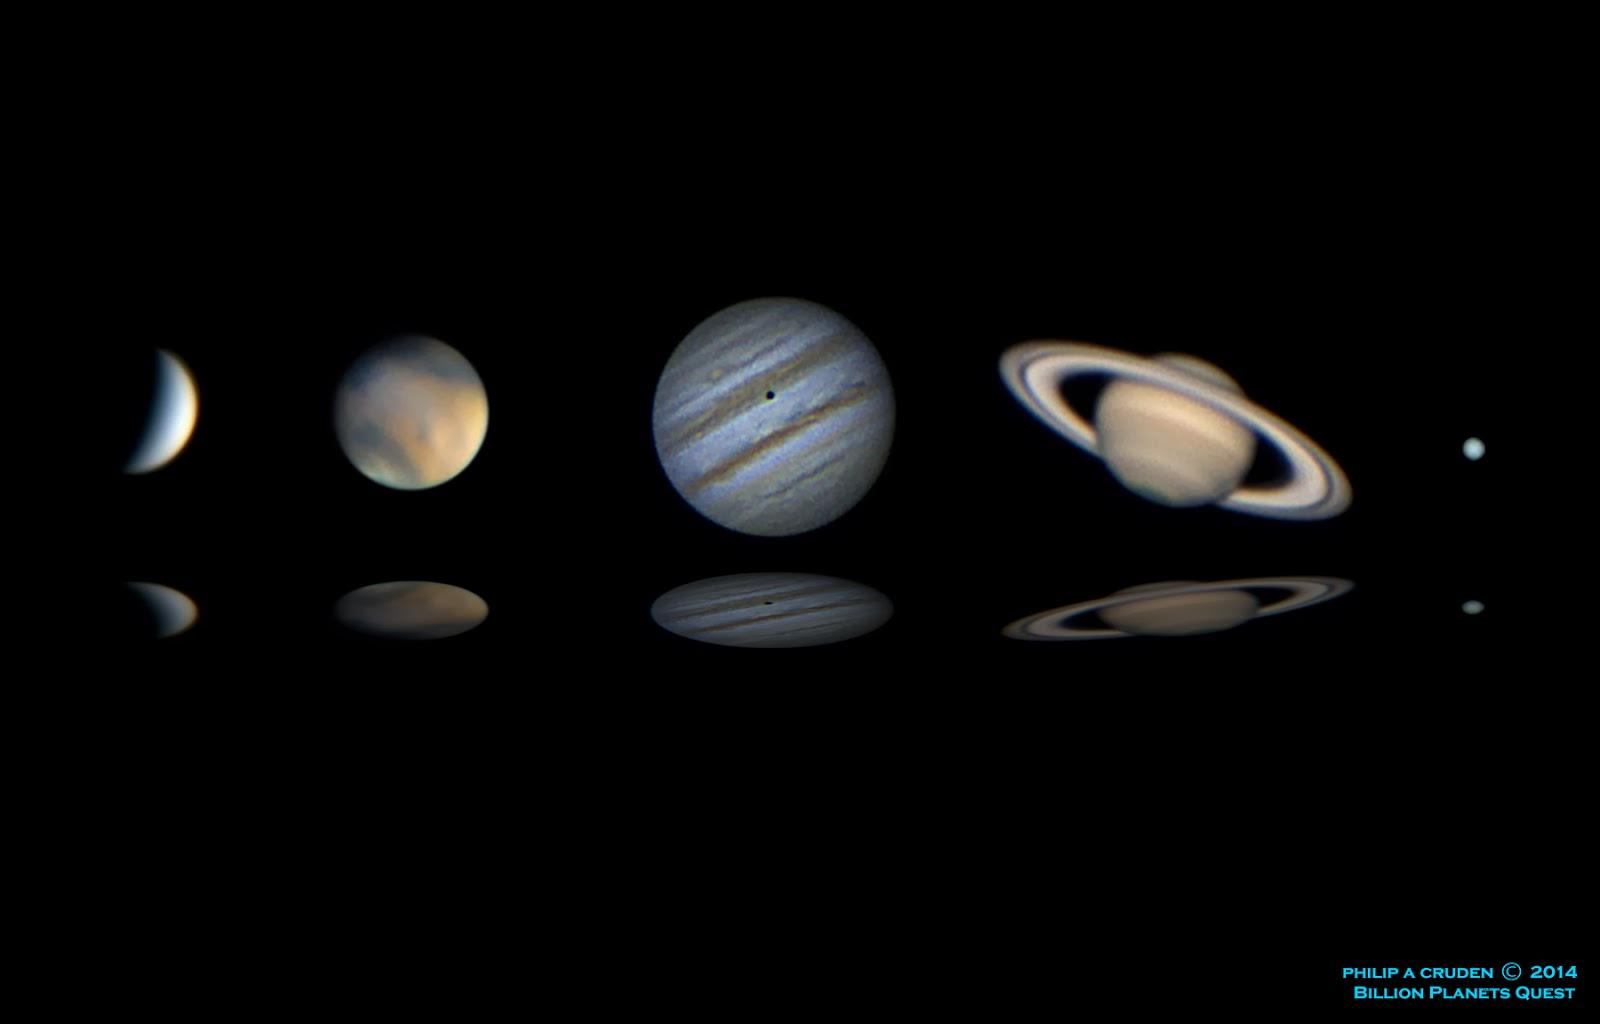 http://www.billionplanetsquest.com/p/planets.html